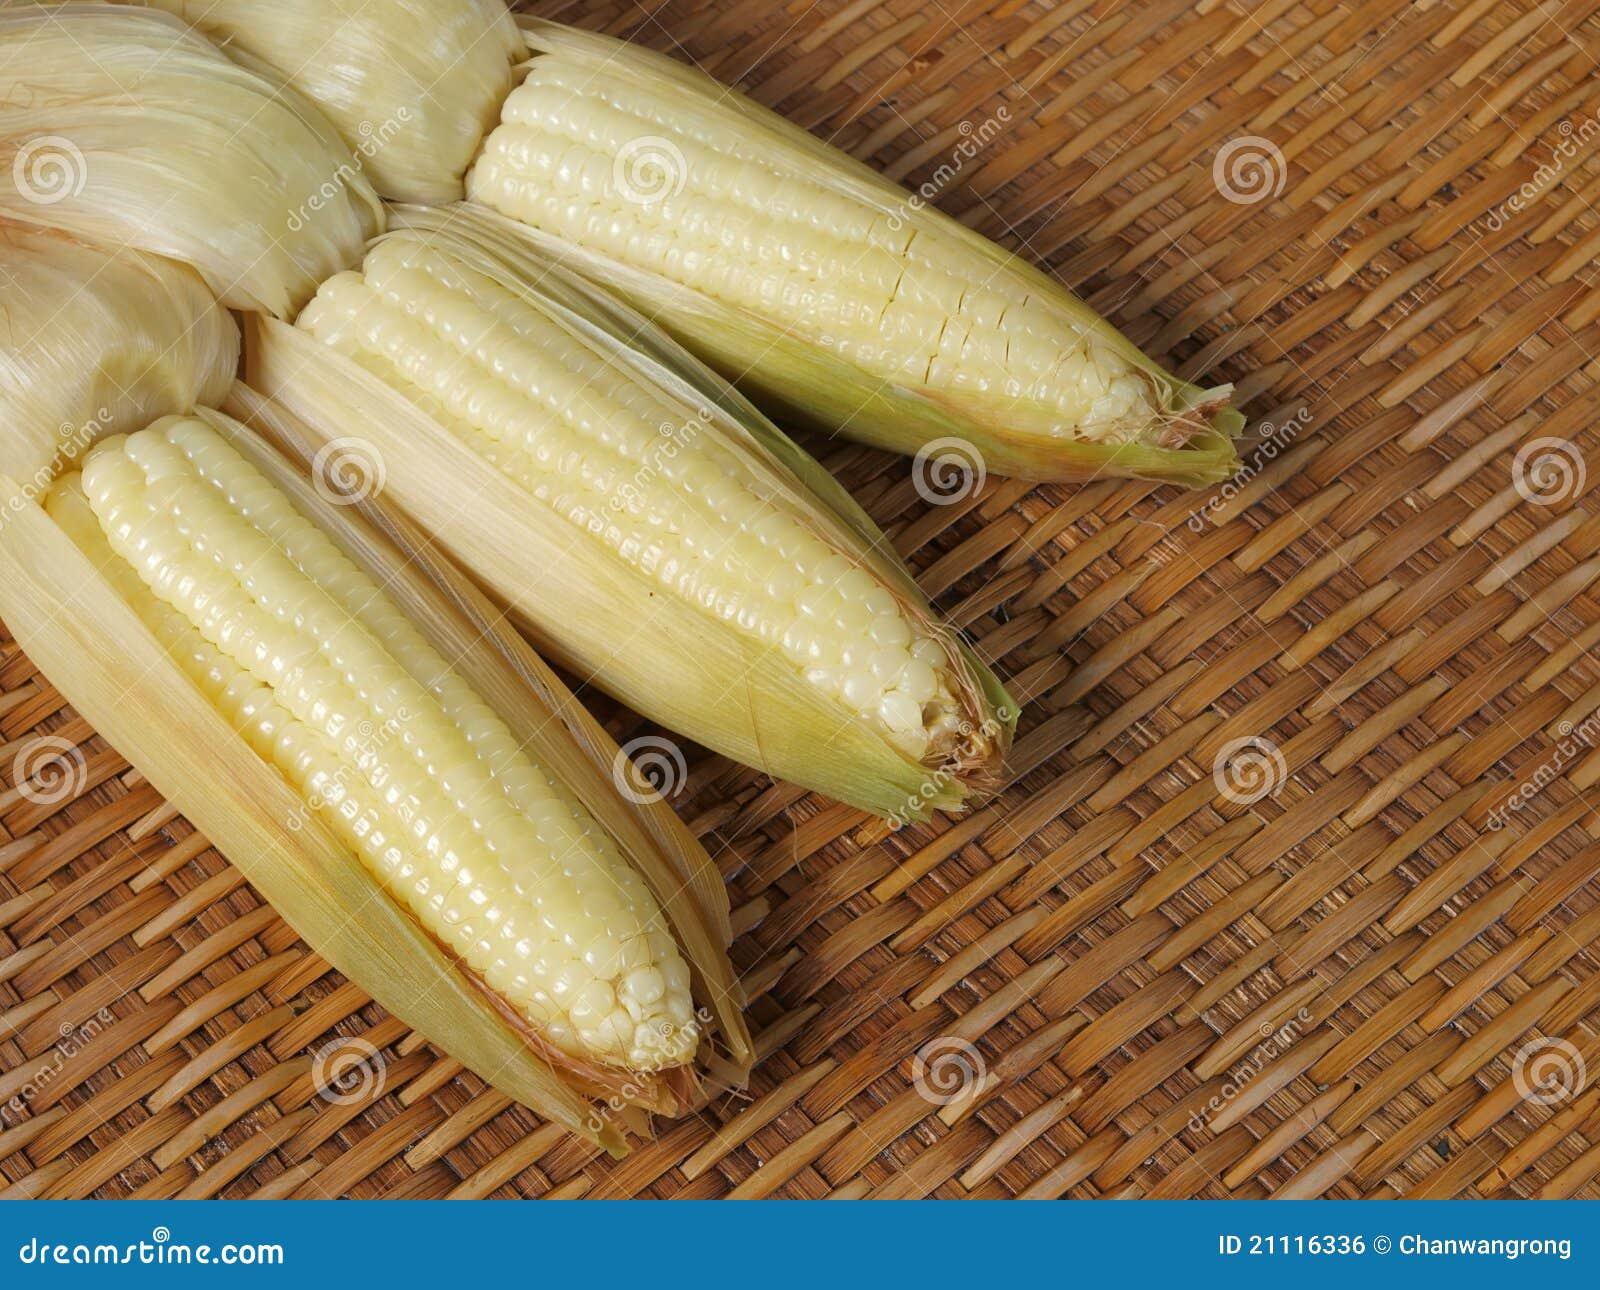 Boiled Waxy Corn Royalty Free Stock Image - Image: 21116336